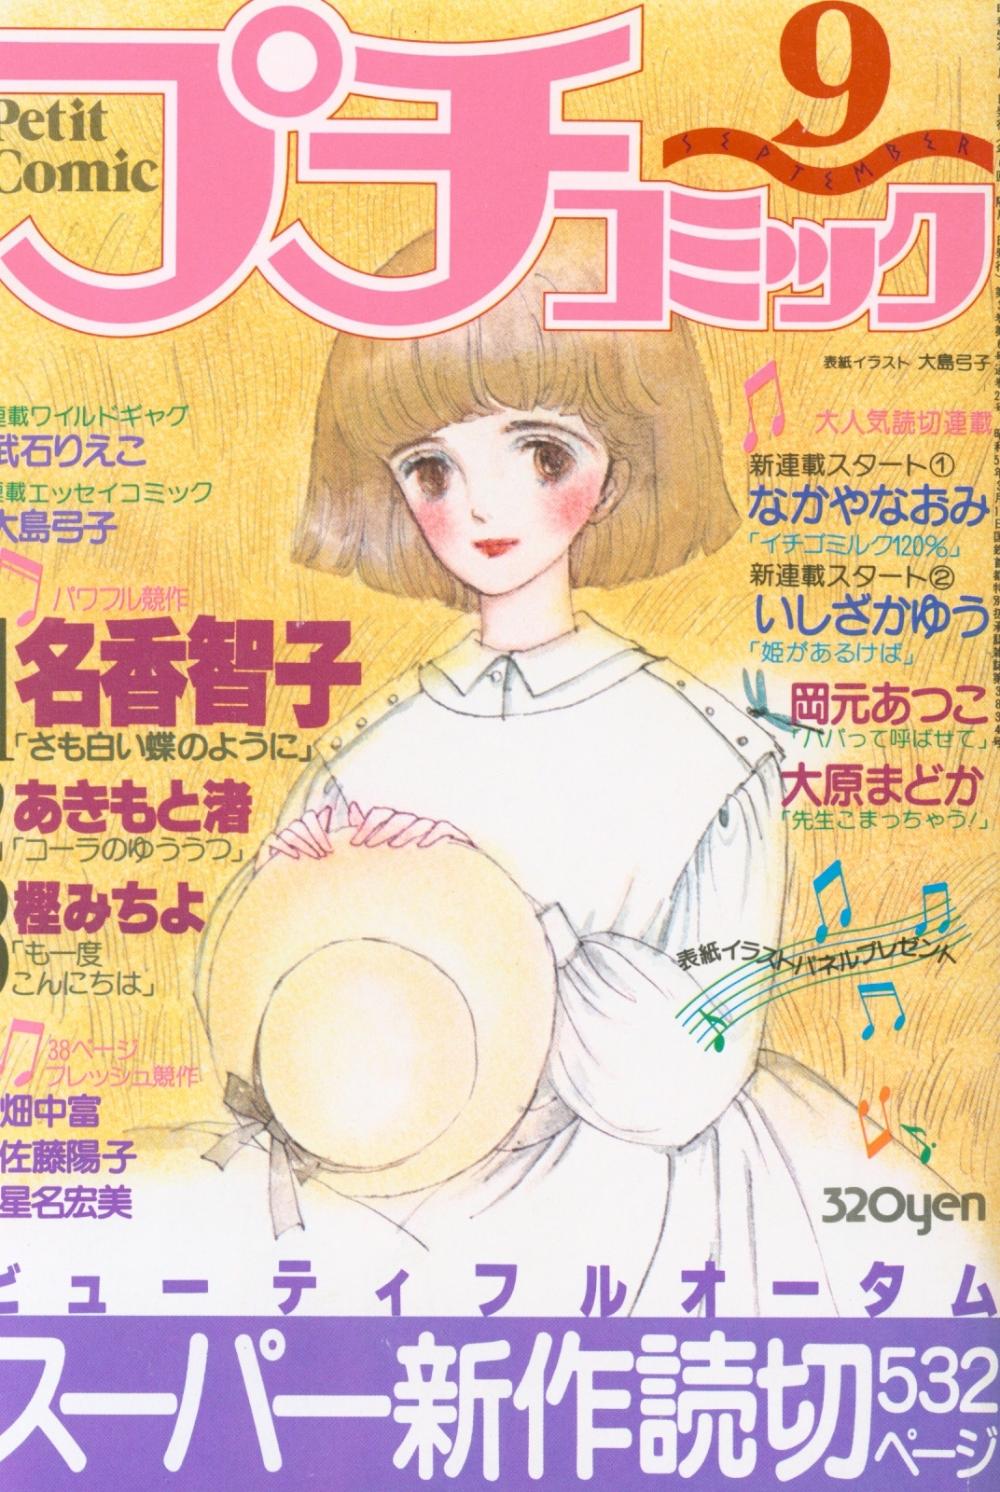 feh yes vintage manga ooshima yumiko petit comic magazine manga history of manga comics